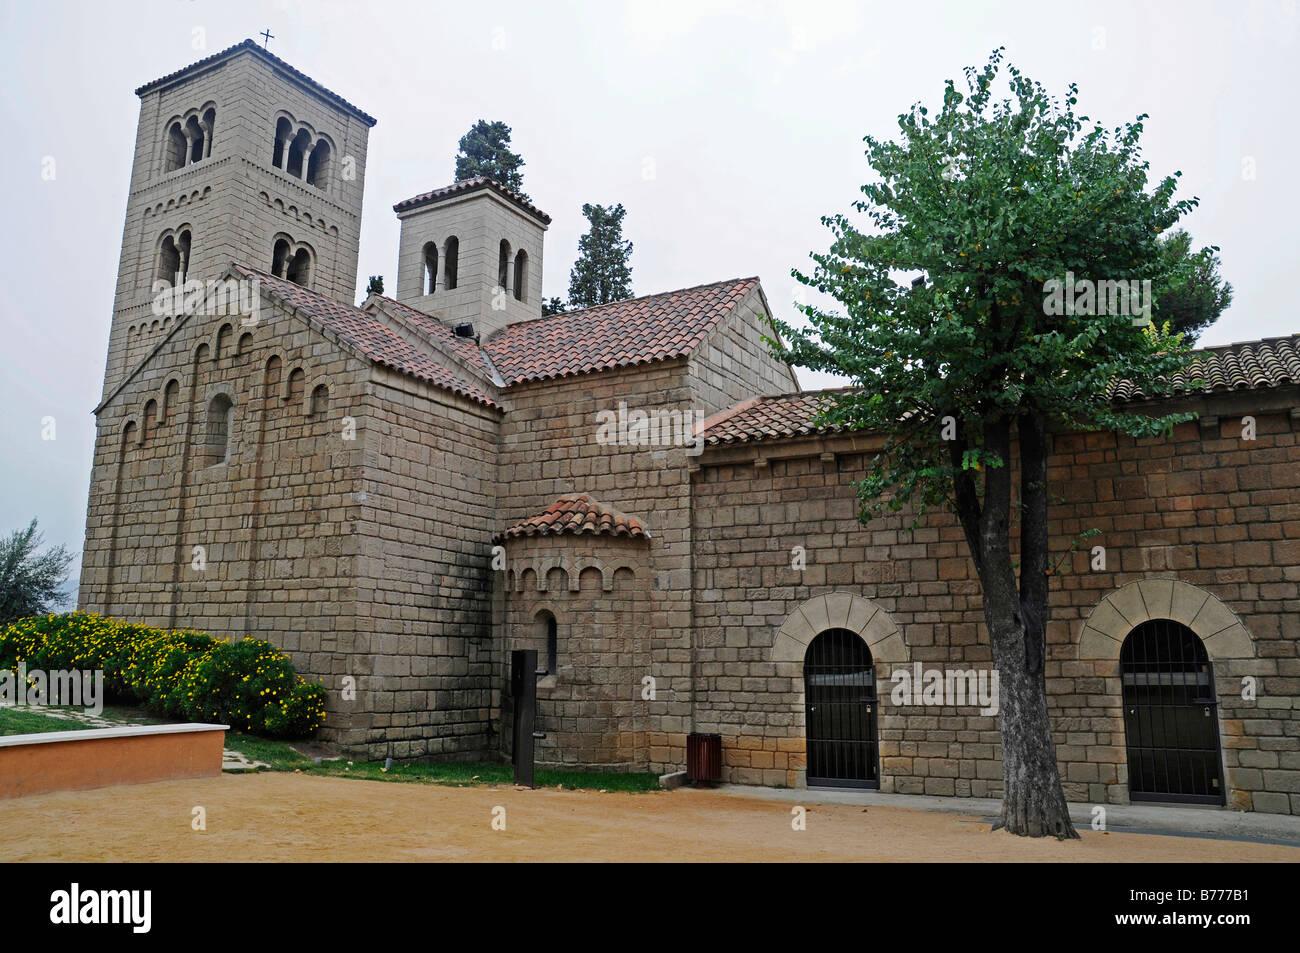 Monasterio Romanico, monastery and church, Poble Espanyol, Spanish village, open-air museum, Montjuic, Barcelona, - Stock Image